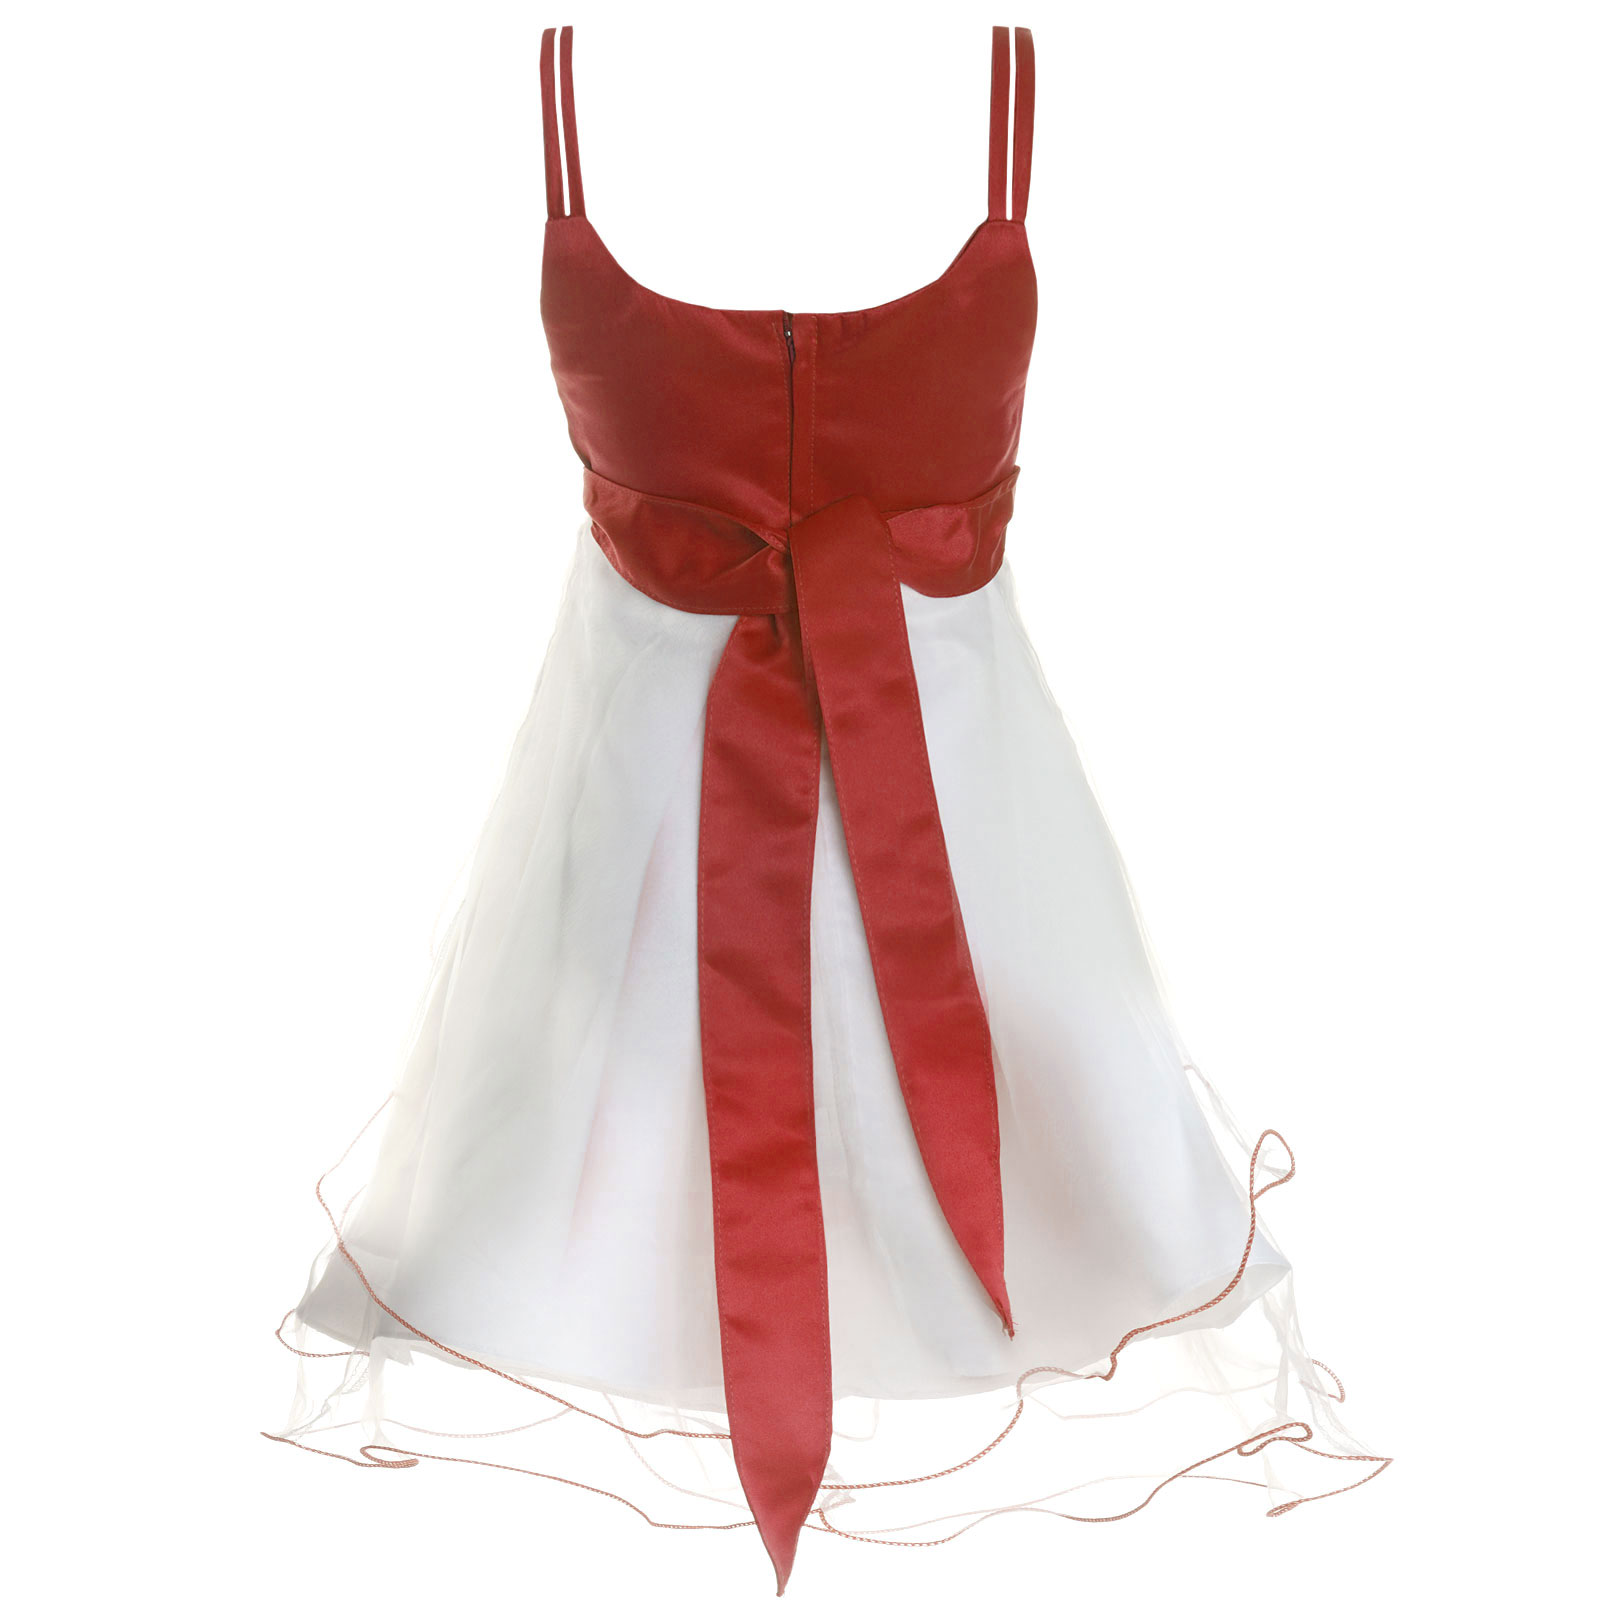 Maedchen-Kinder-Kleid-Peticoat-Festkleid-Lang-Arm-Kostuem-mit-Bolero-Rose-21476 Indexbild 5